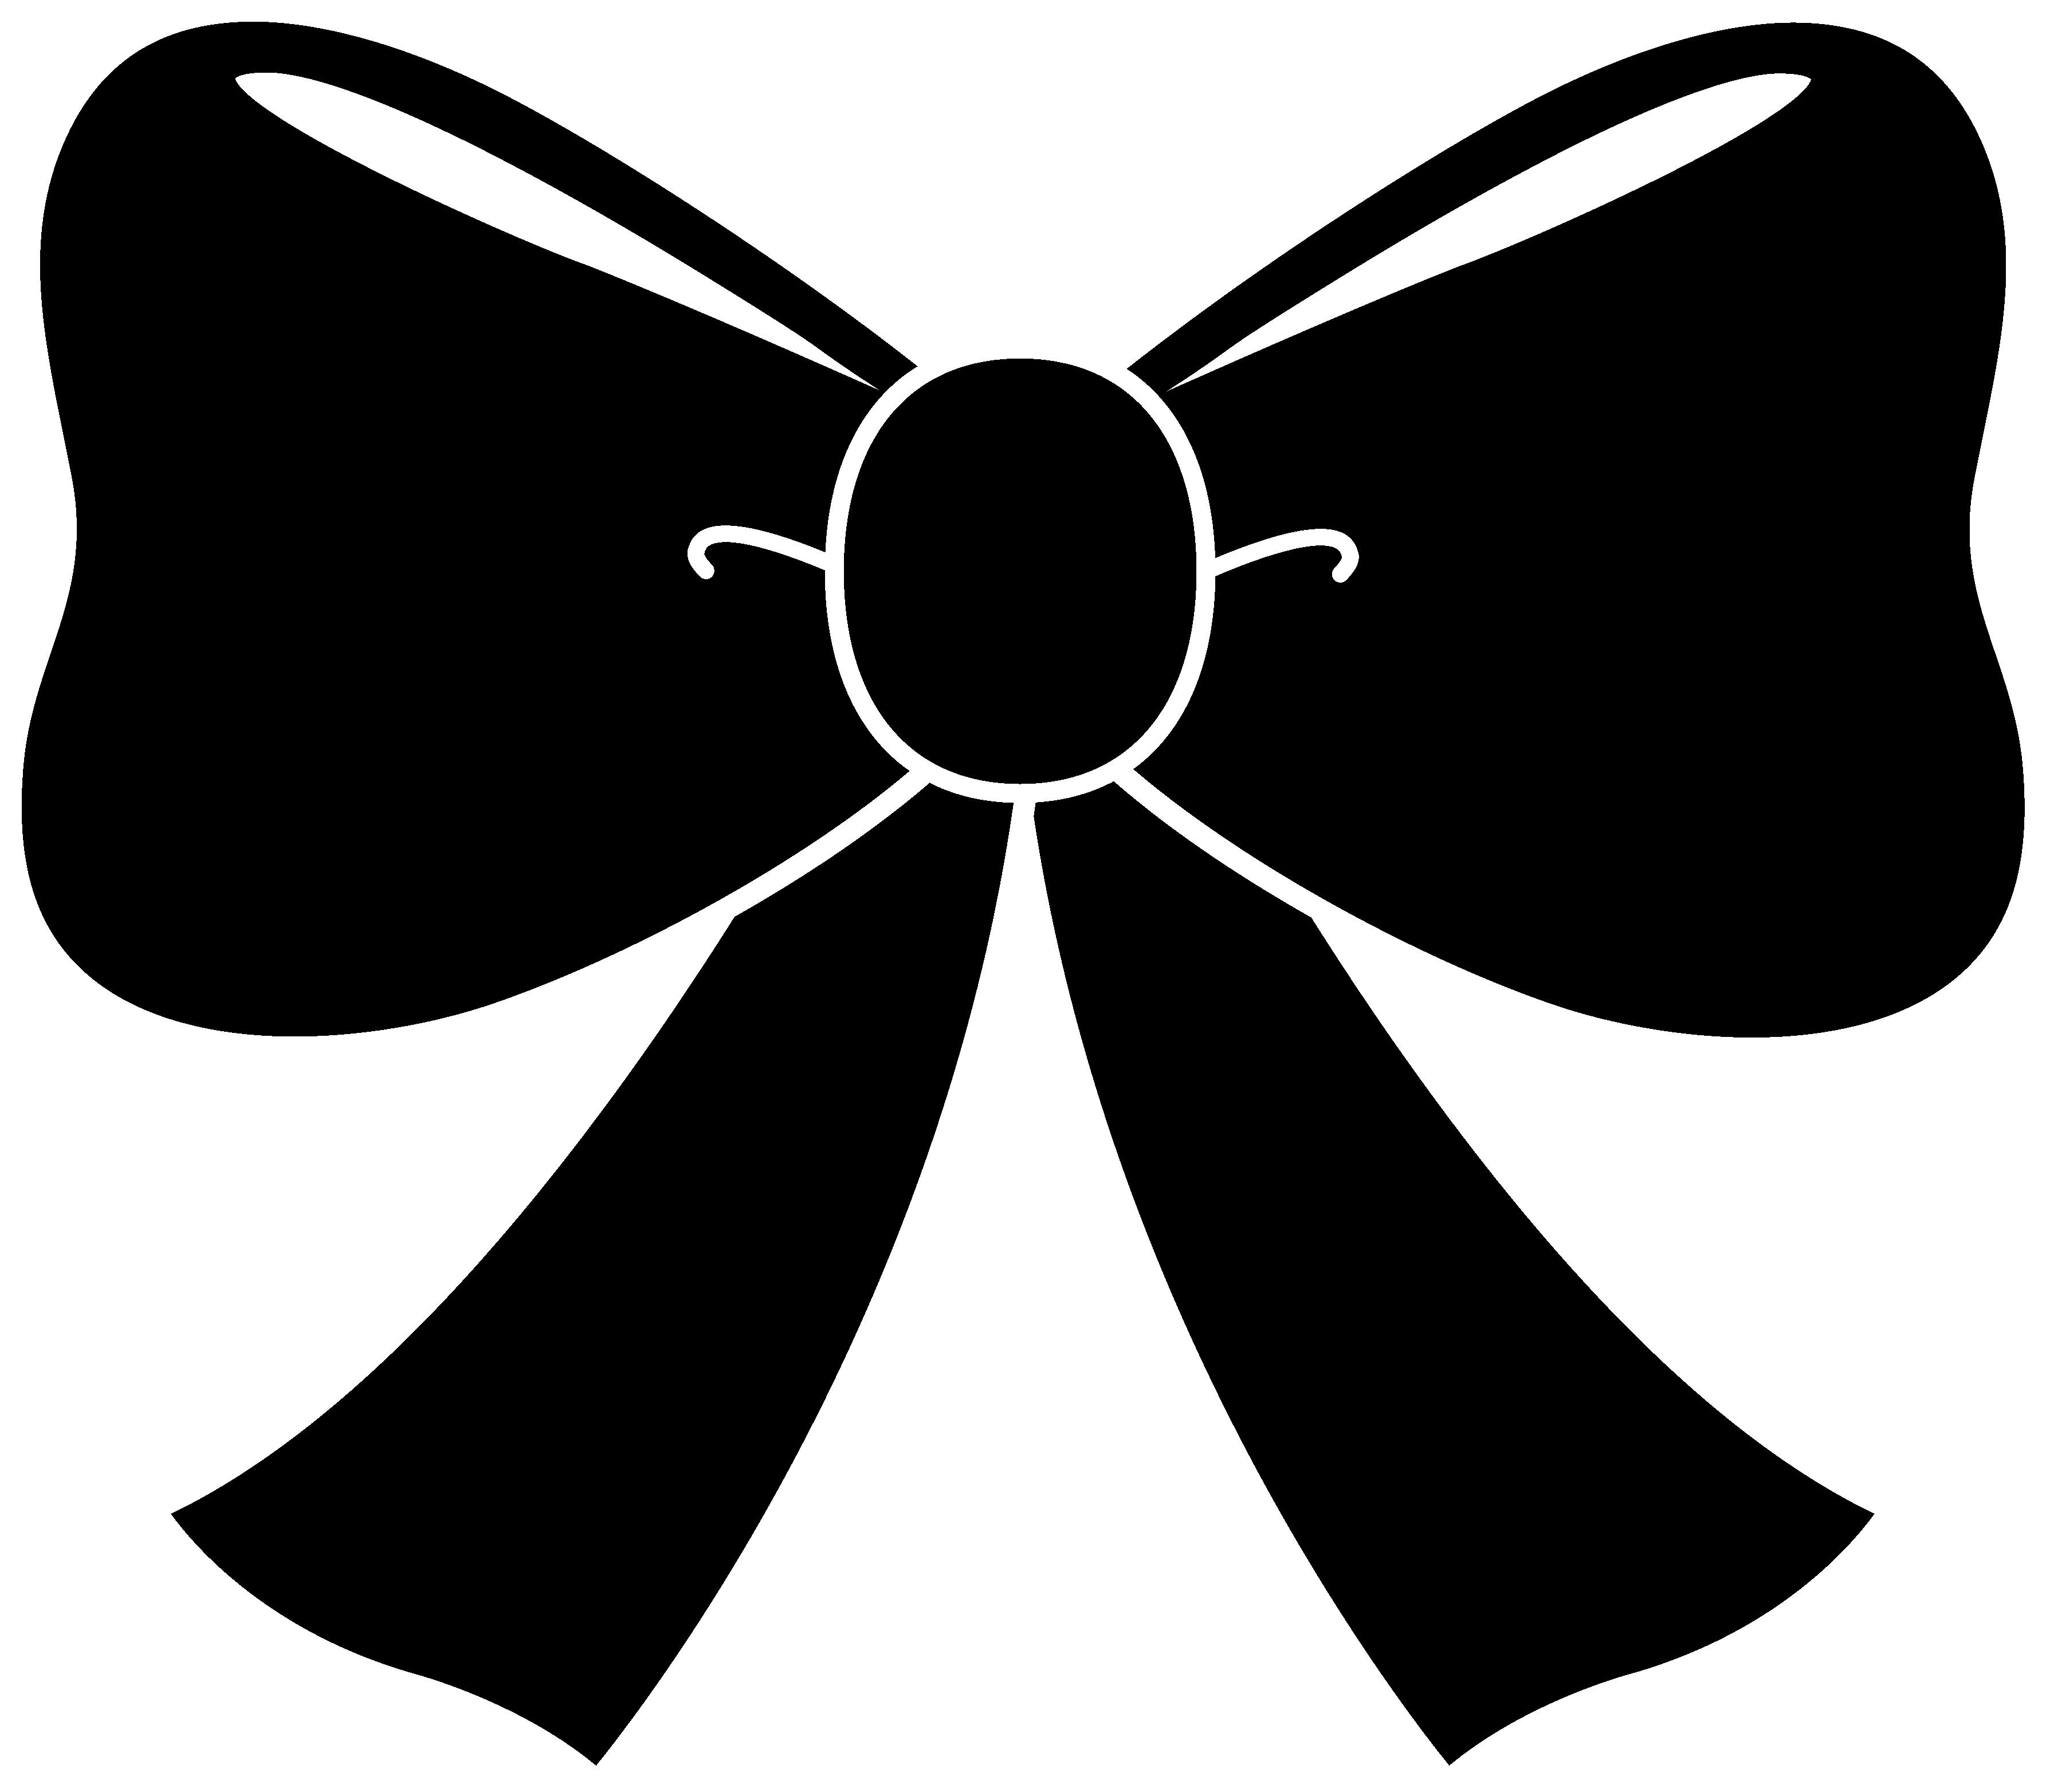 Cute Black Bow Clipart-Cute Black Bow Clipart-13